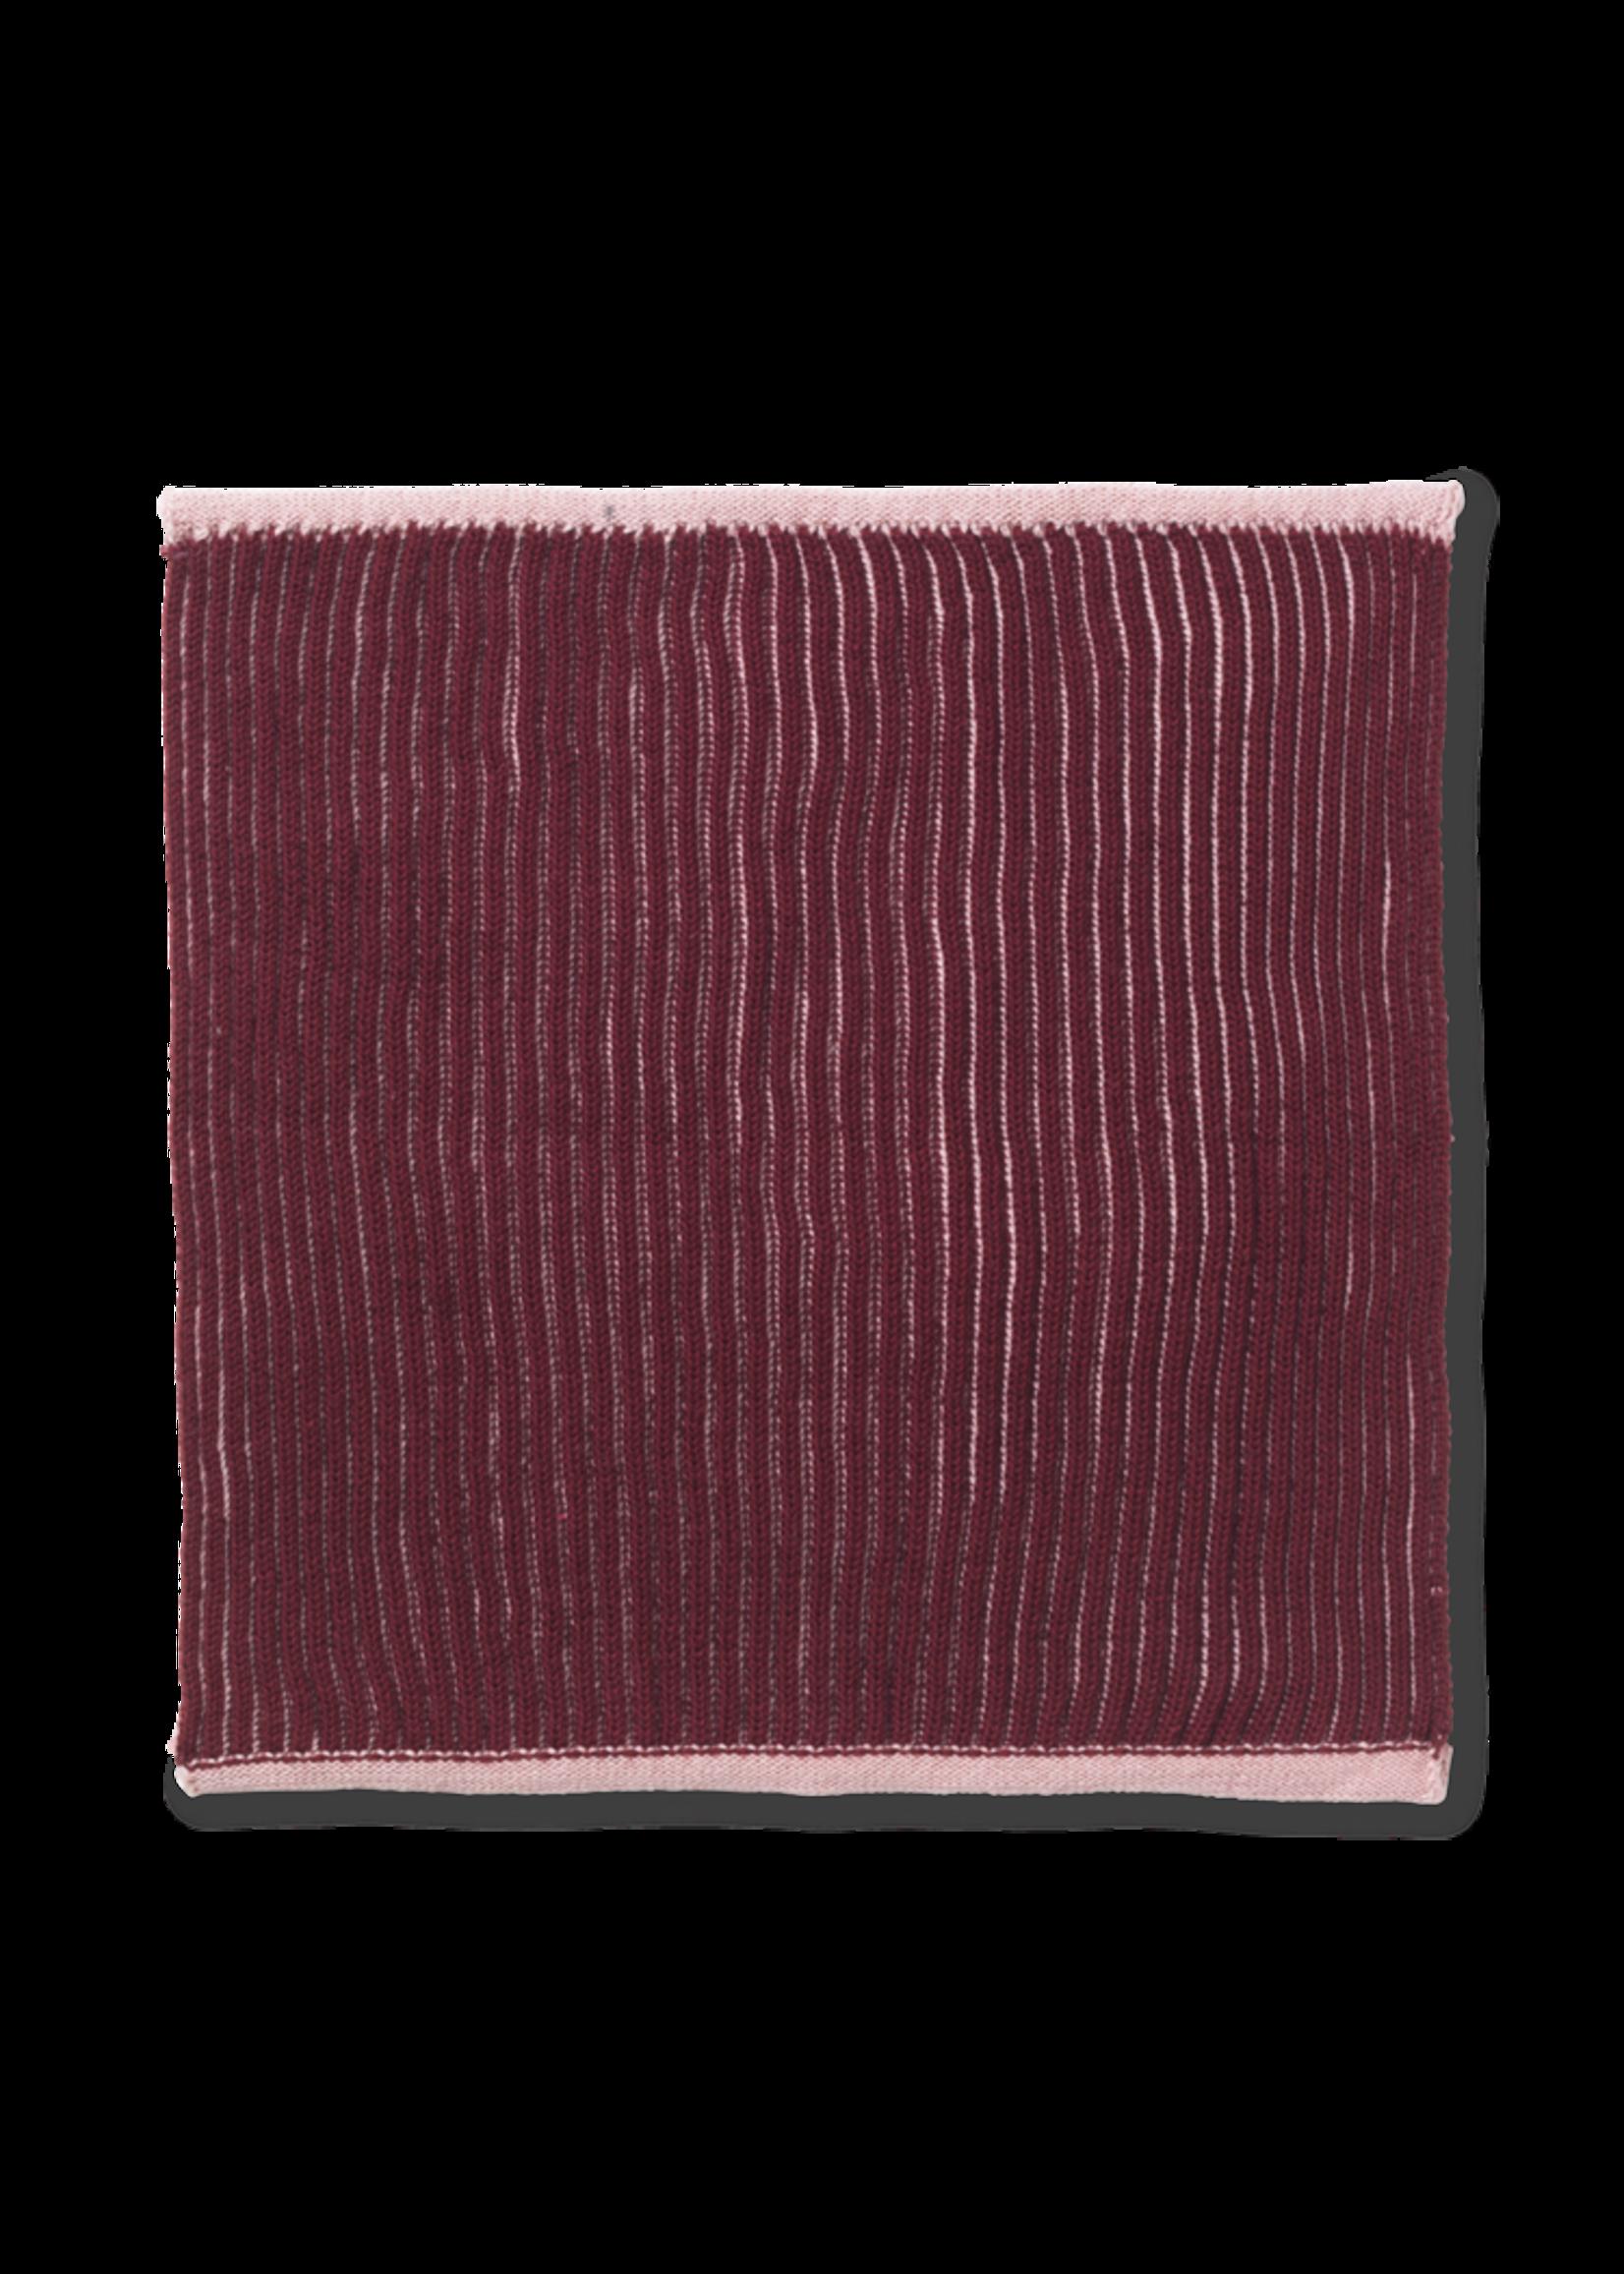 ferm LIVING ferm LIVING Twofold Organic Cotton Dishcloth  - Red